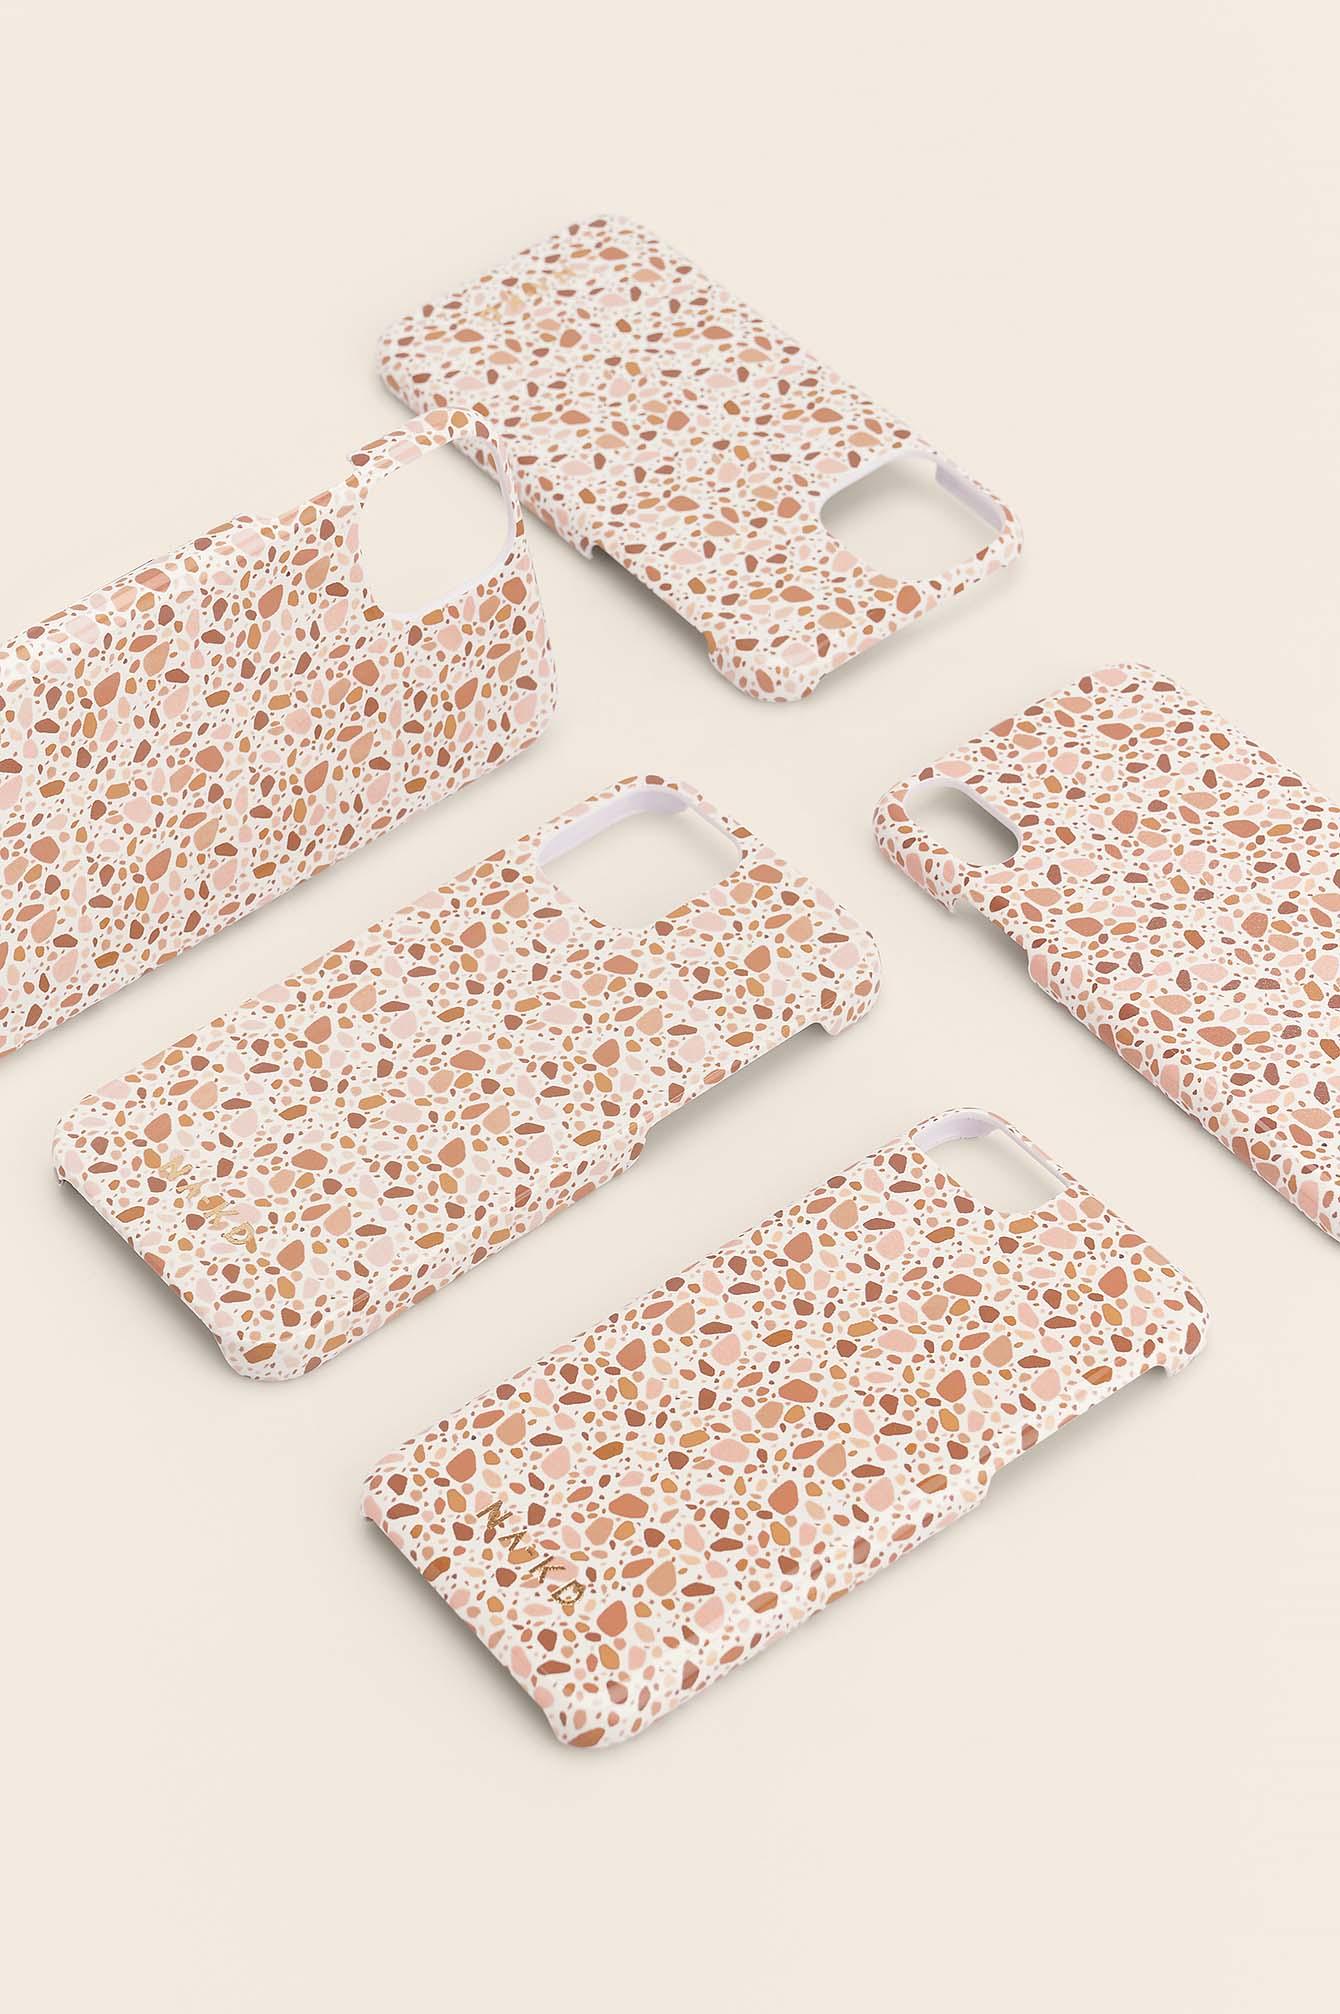 NA-KD Accessories Printed Phone Case - Multicolor